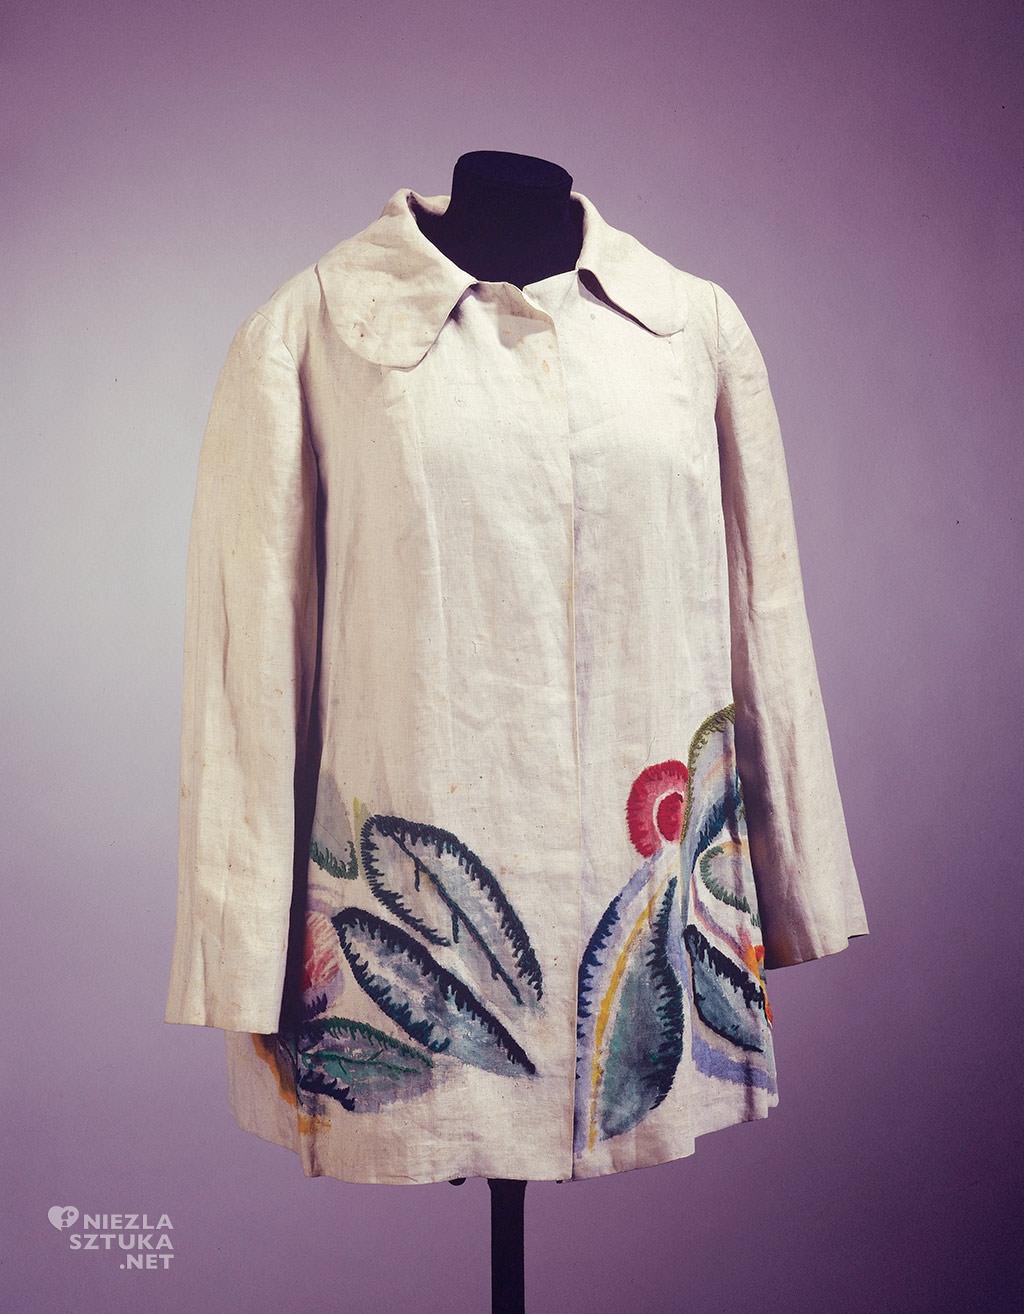 Sonia Delaunay, Żakiet, Niezła Sztuka